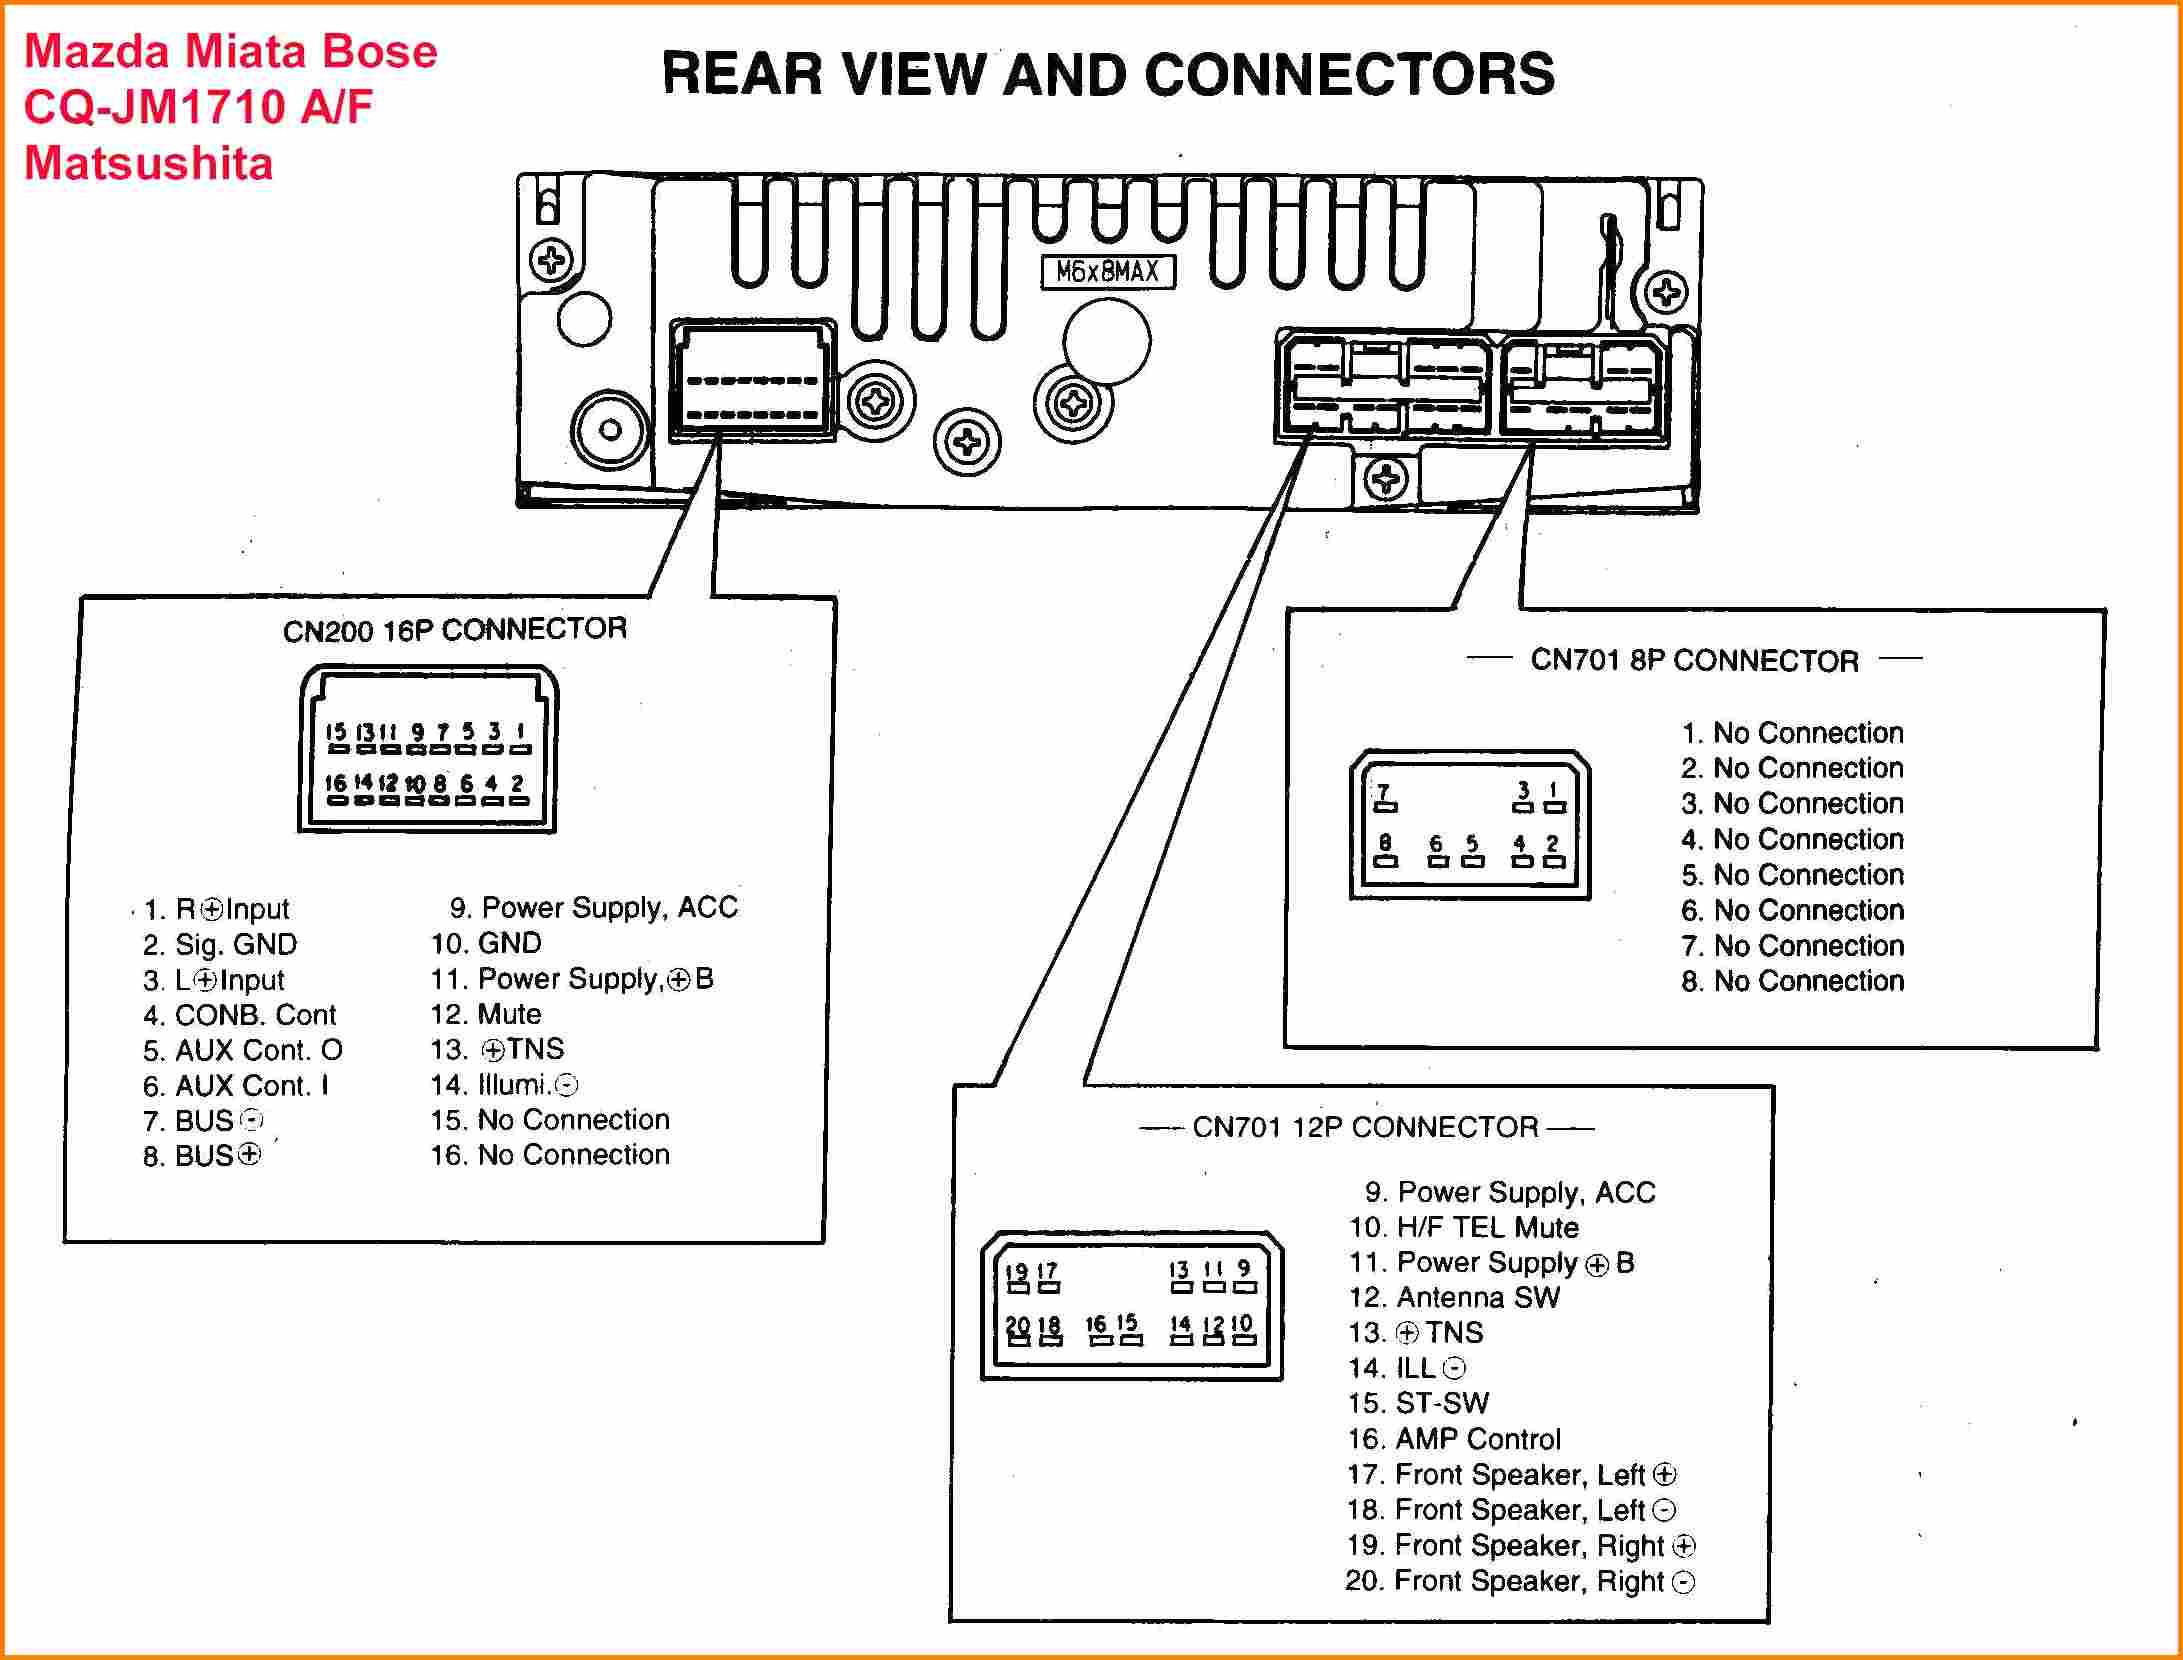 DIAGRAM] Wiring Diagram Pioneer Mvh 155ui FULL Version HD Quality Mvh 155ui  - ILWIRING2CX.PULITURA2M.IT pulitura2m.it